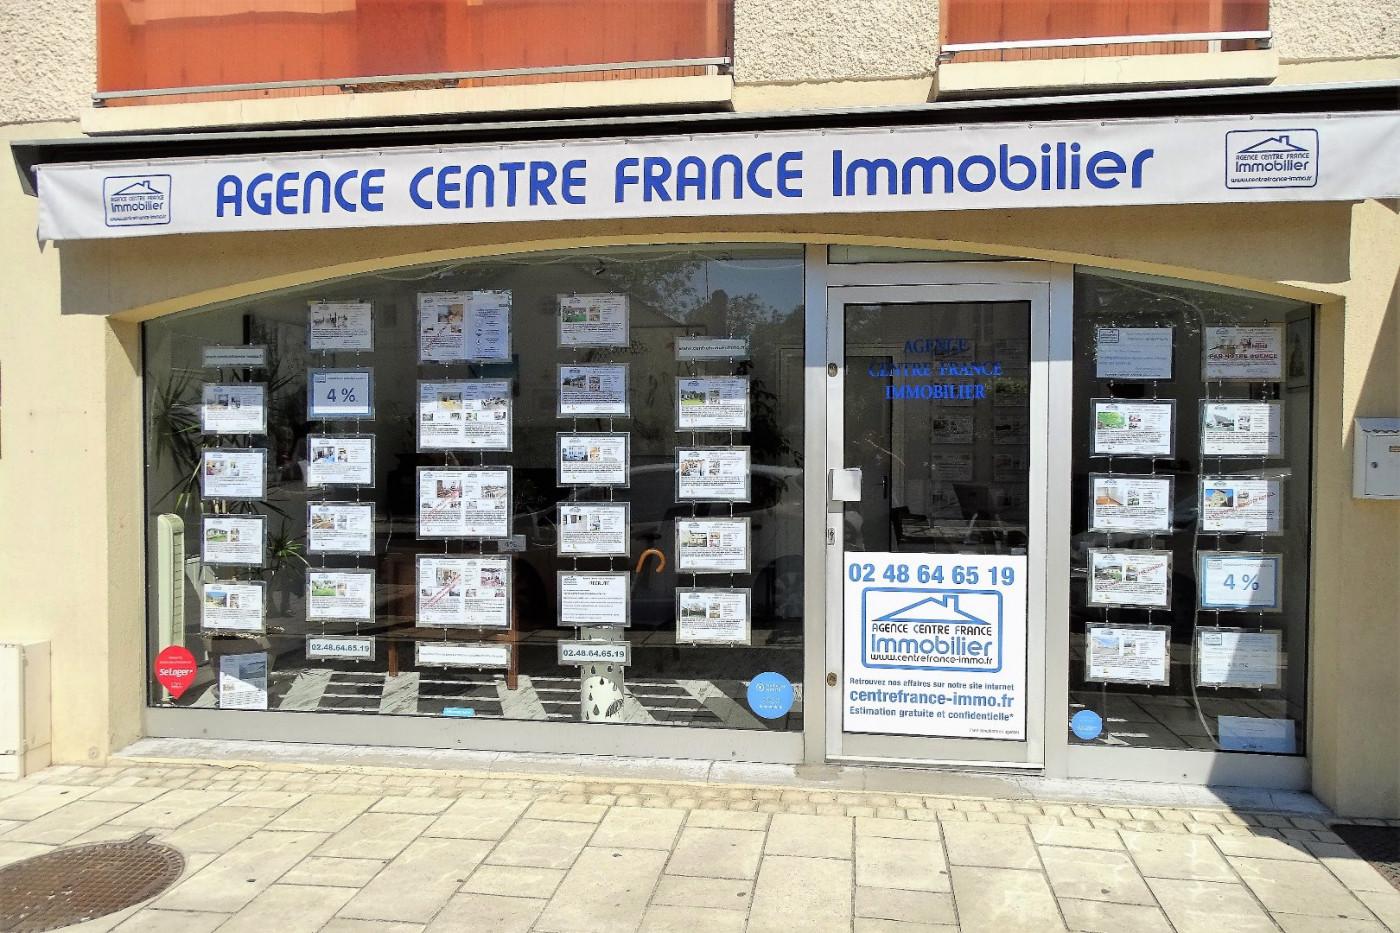 A vendre  Bourges   Réf 030011504 - Agence centre france immobilier